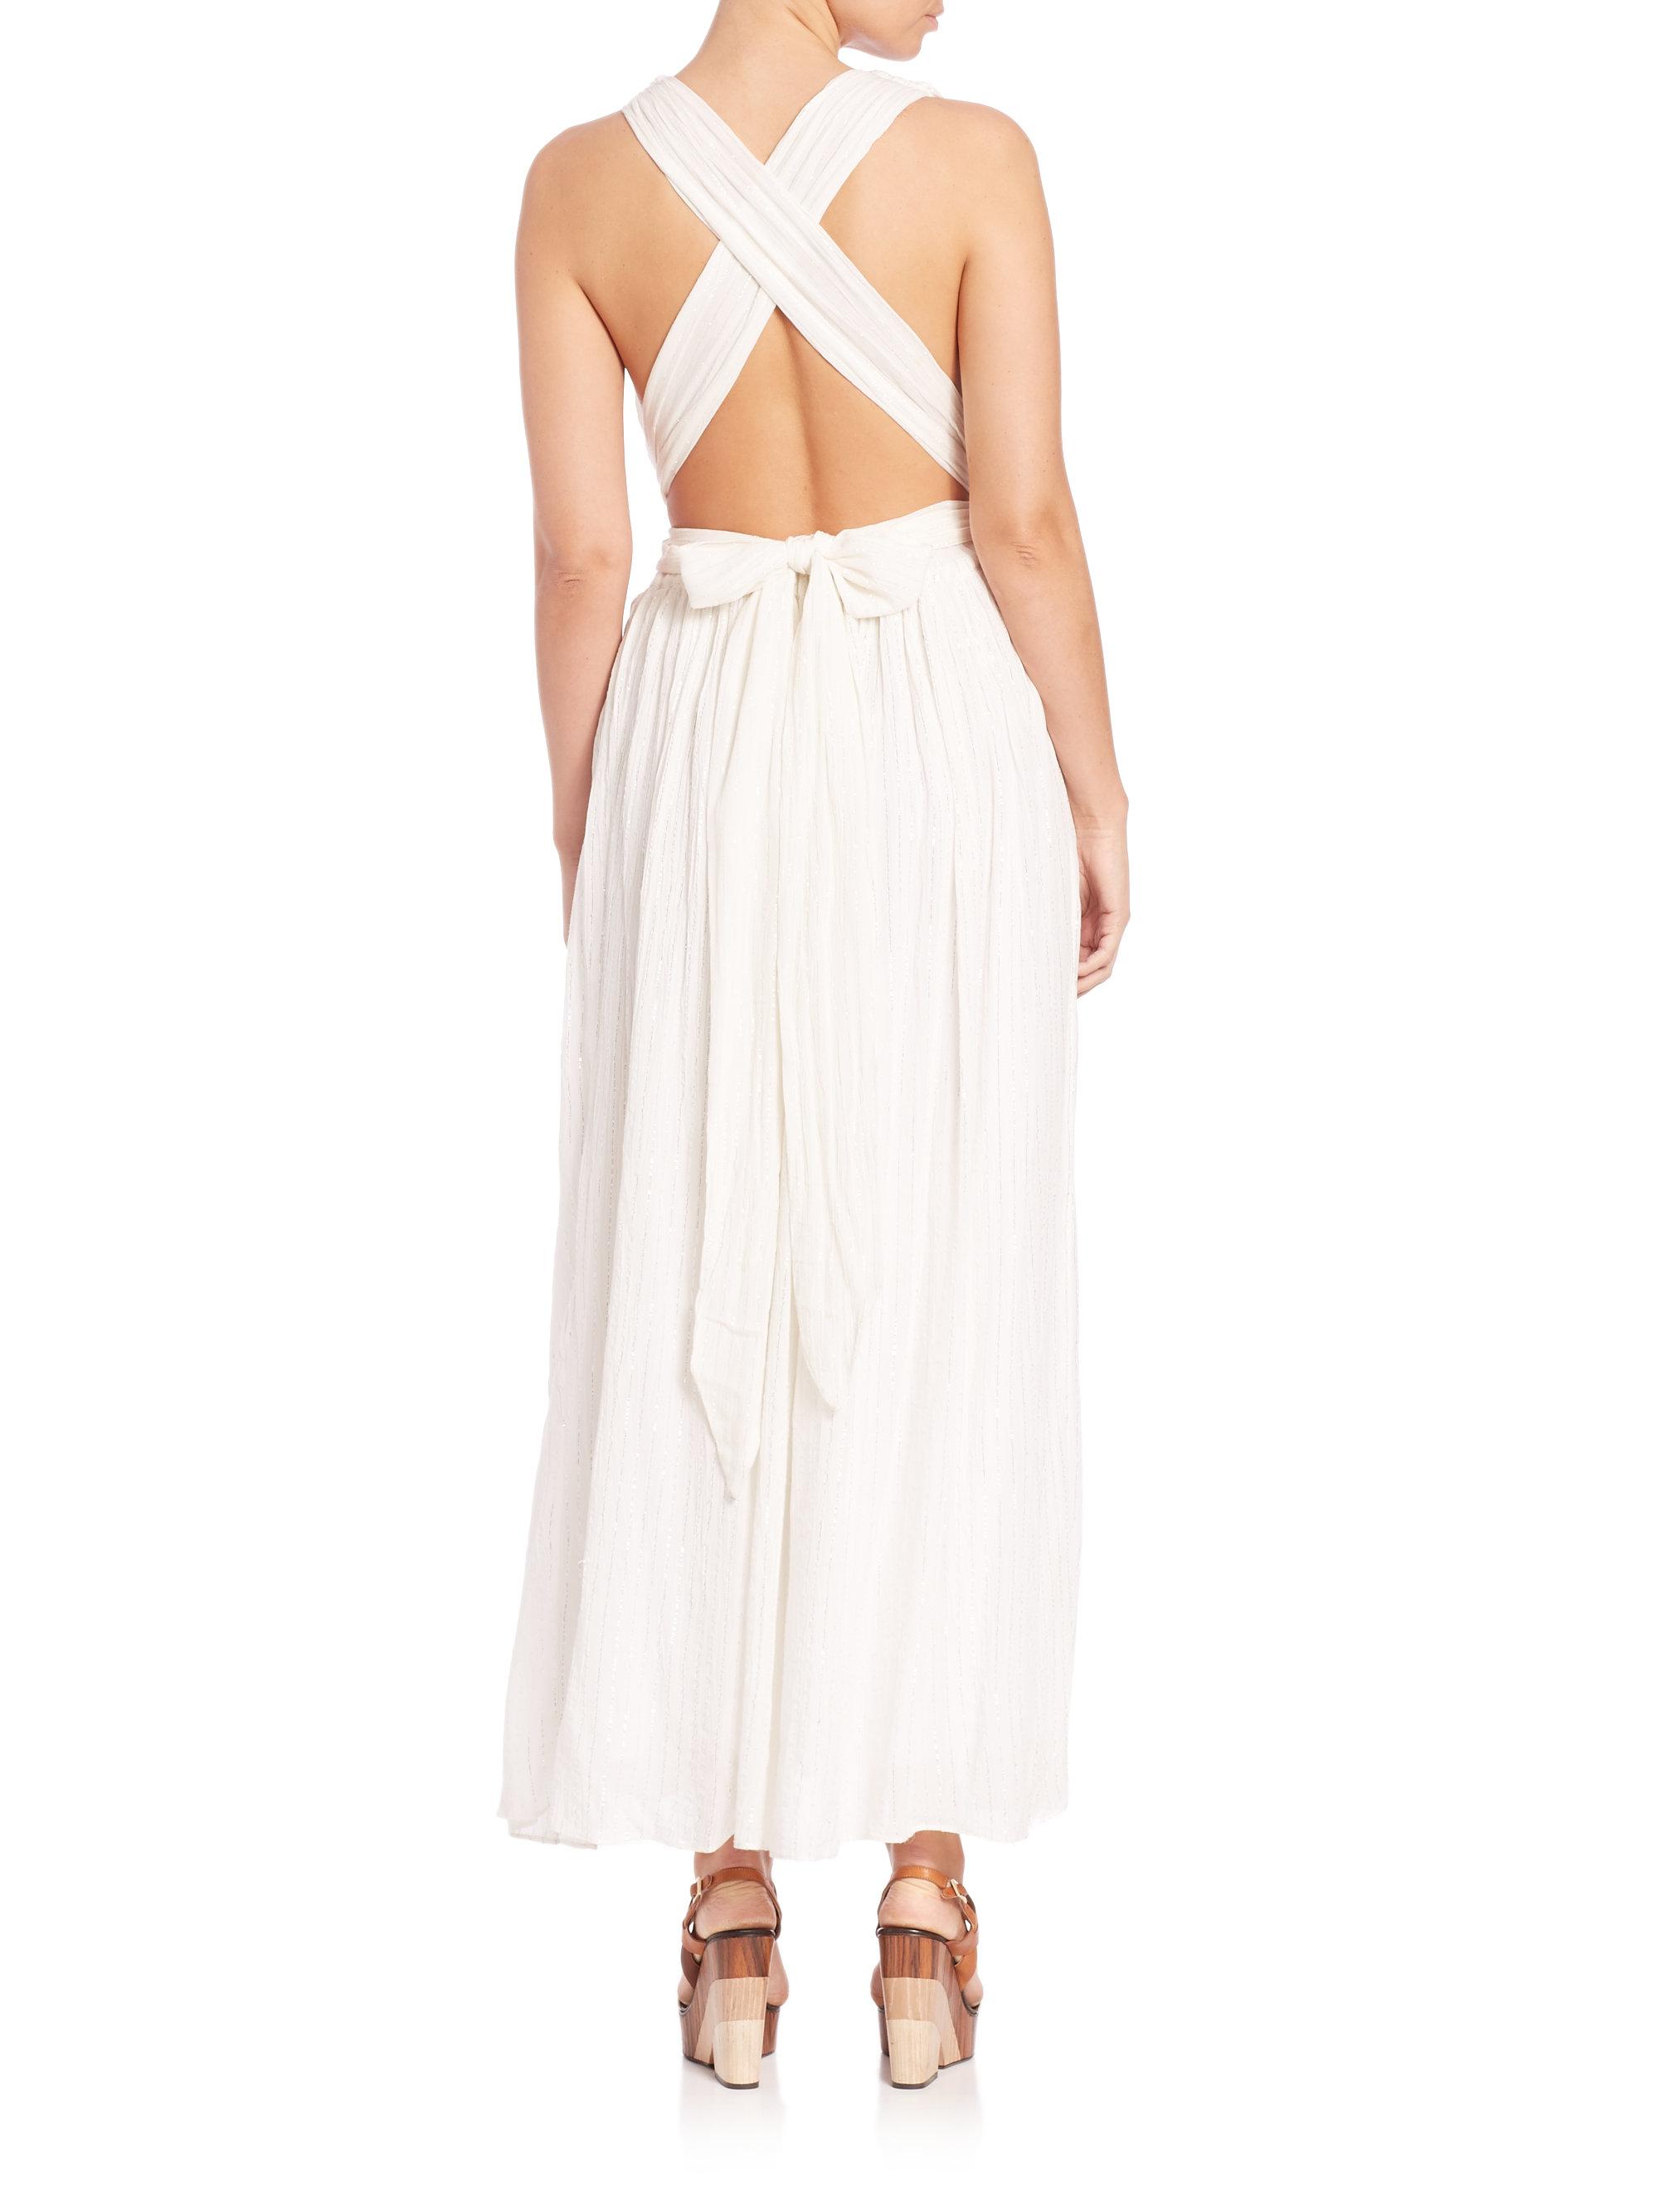 Mara hoffman Metallic Cotton Wrap Dress in White | Lyst